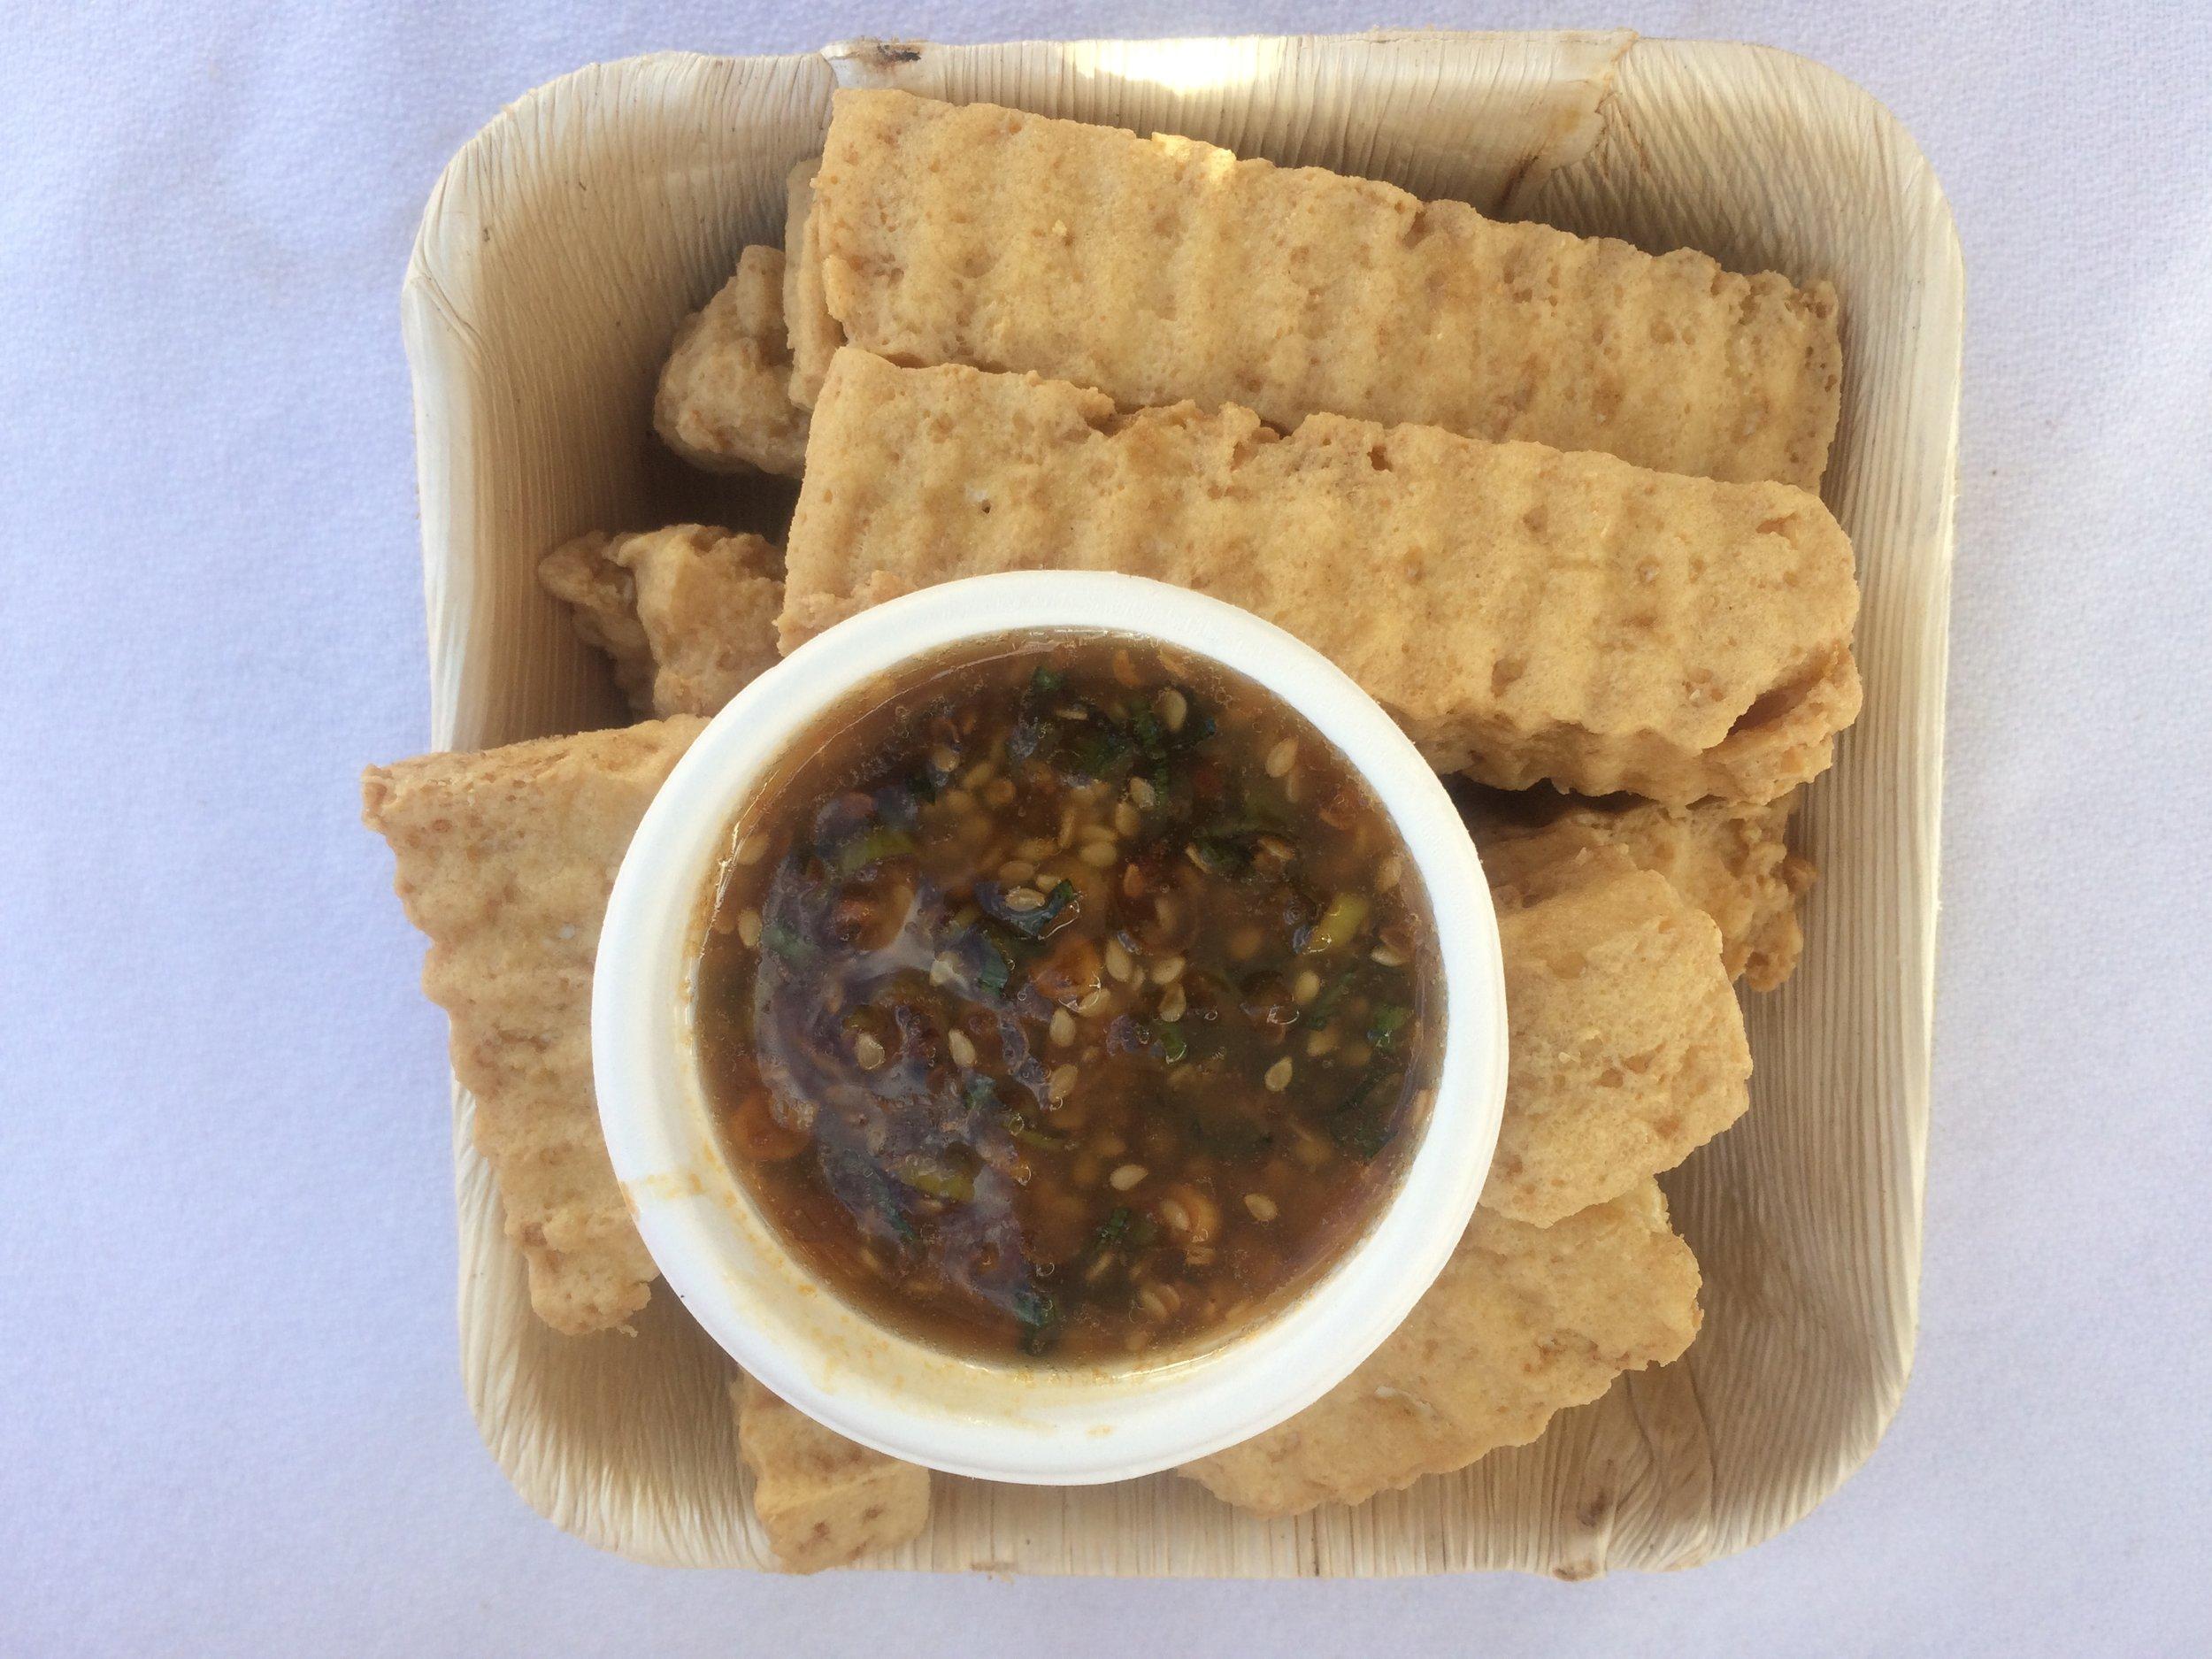 Crinkle-cut sea salt brined tofu fries that's our #1 seller at the fair.